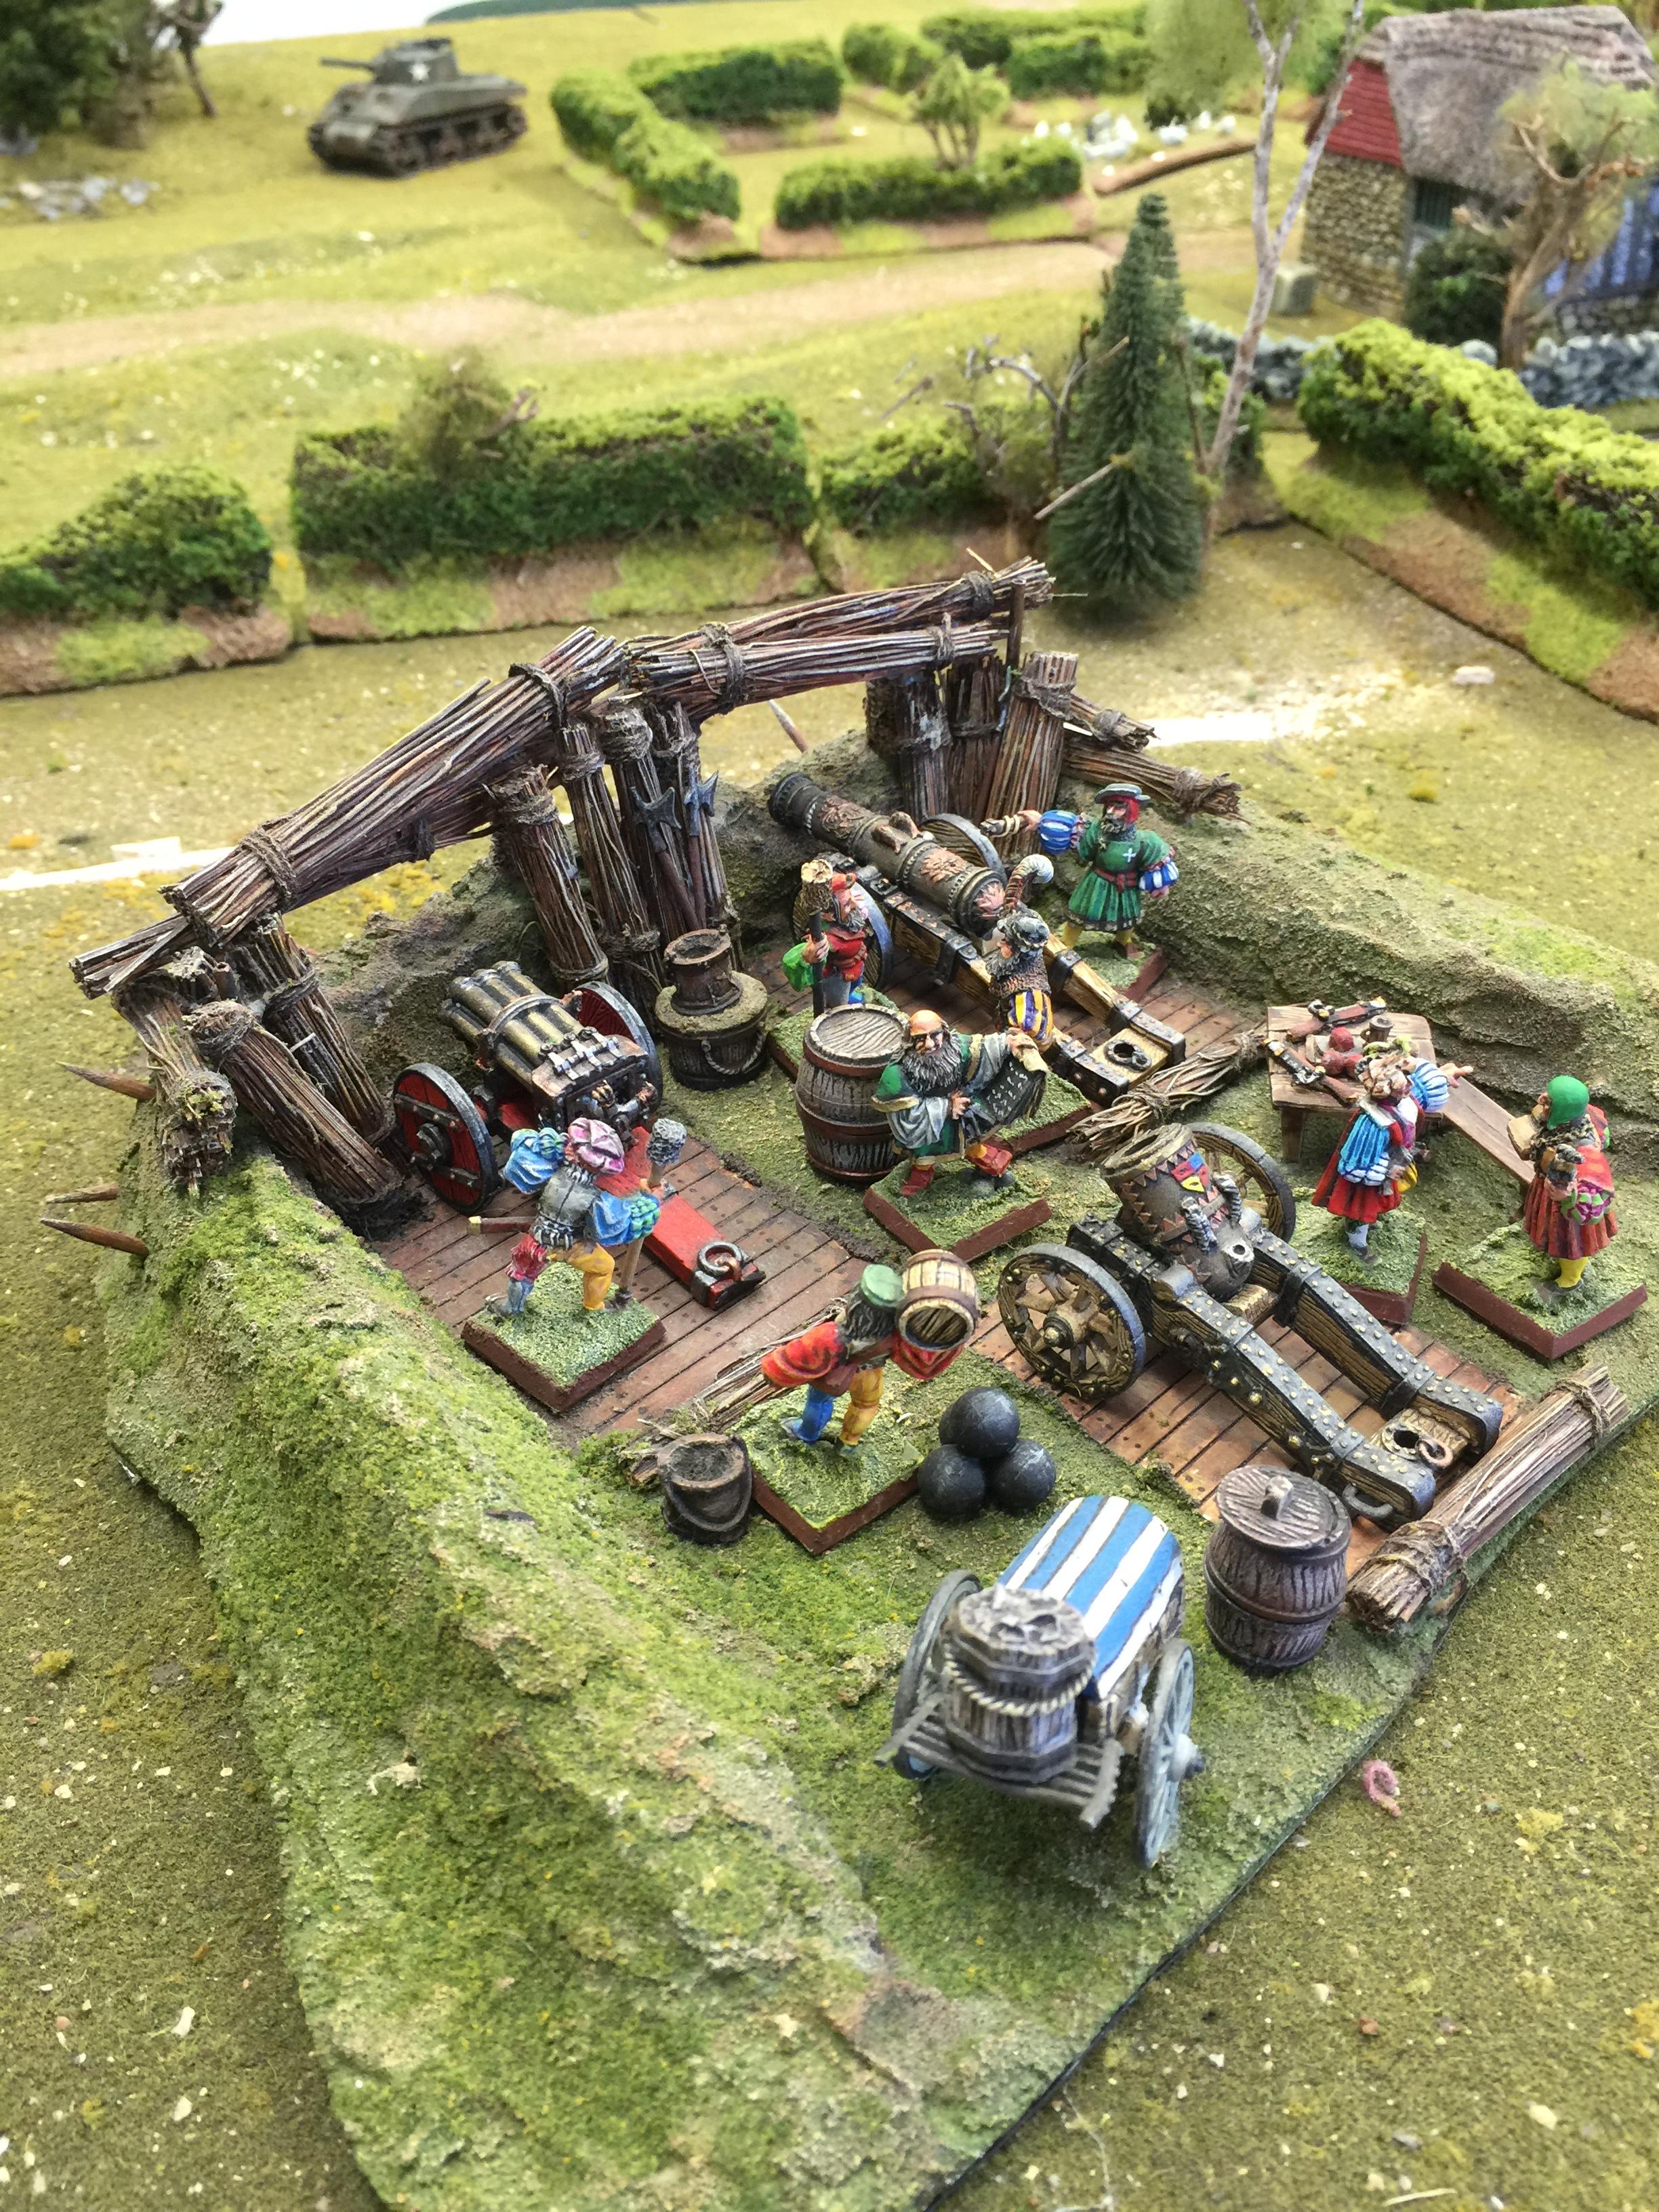 Renaissance Gun Emplacement for French Italian Wars